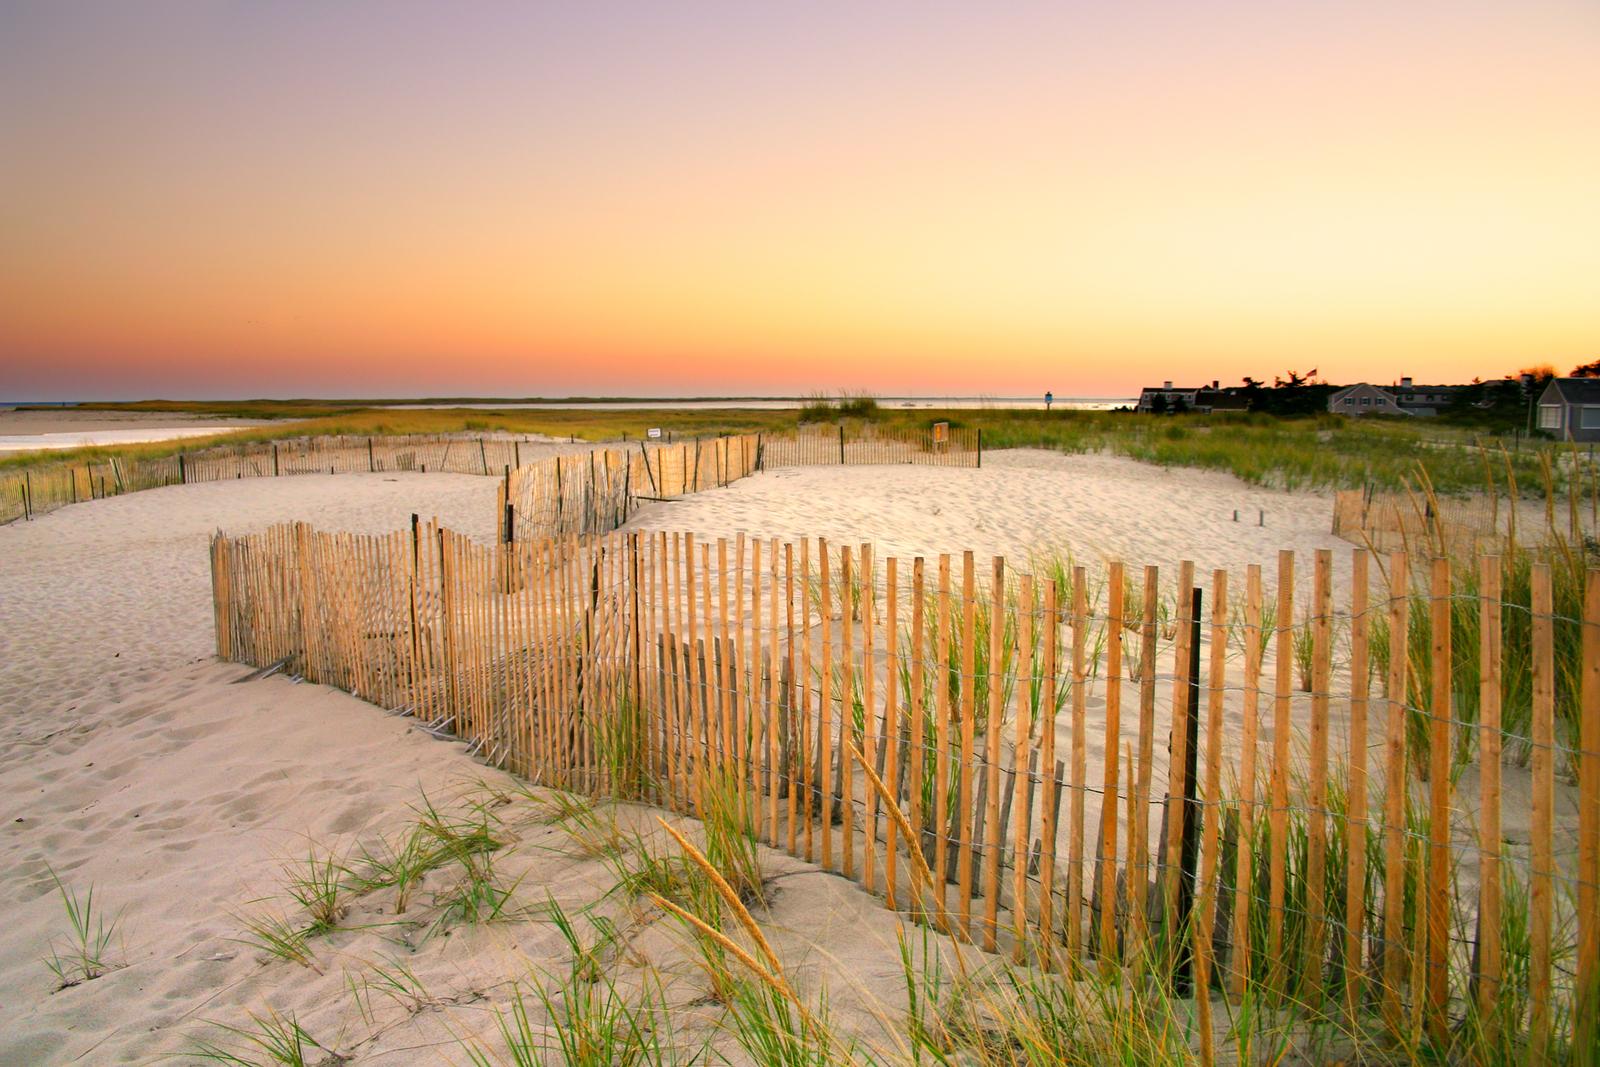 New Big Lots Virginia Beach